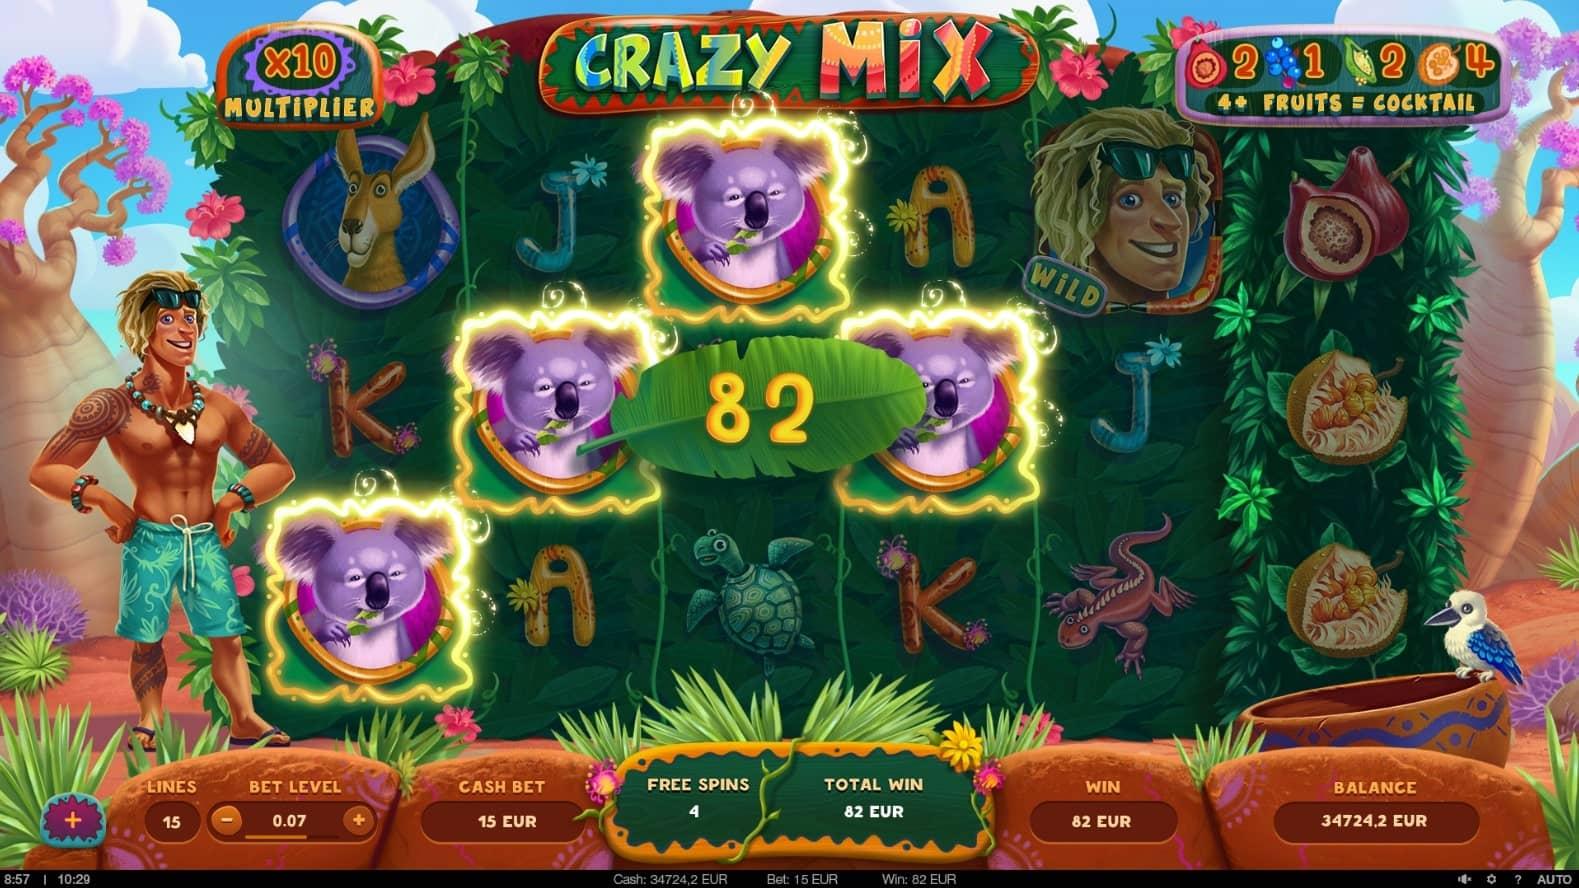 Crazy Mix Slot Free Spins